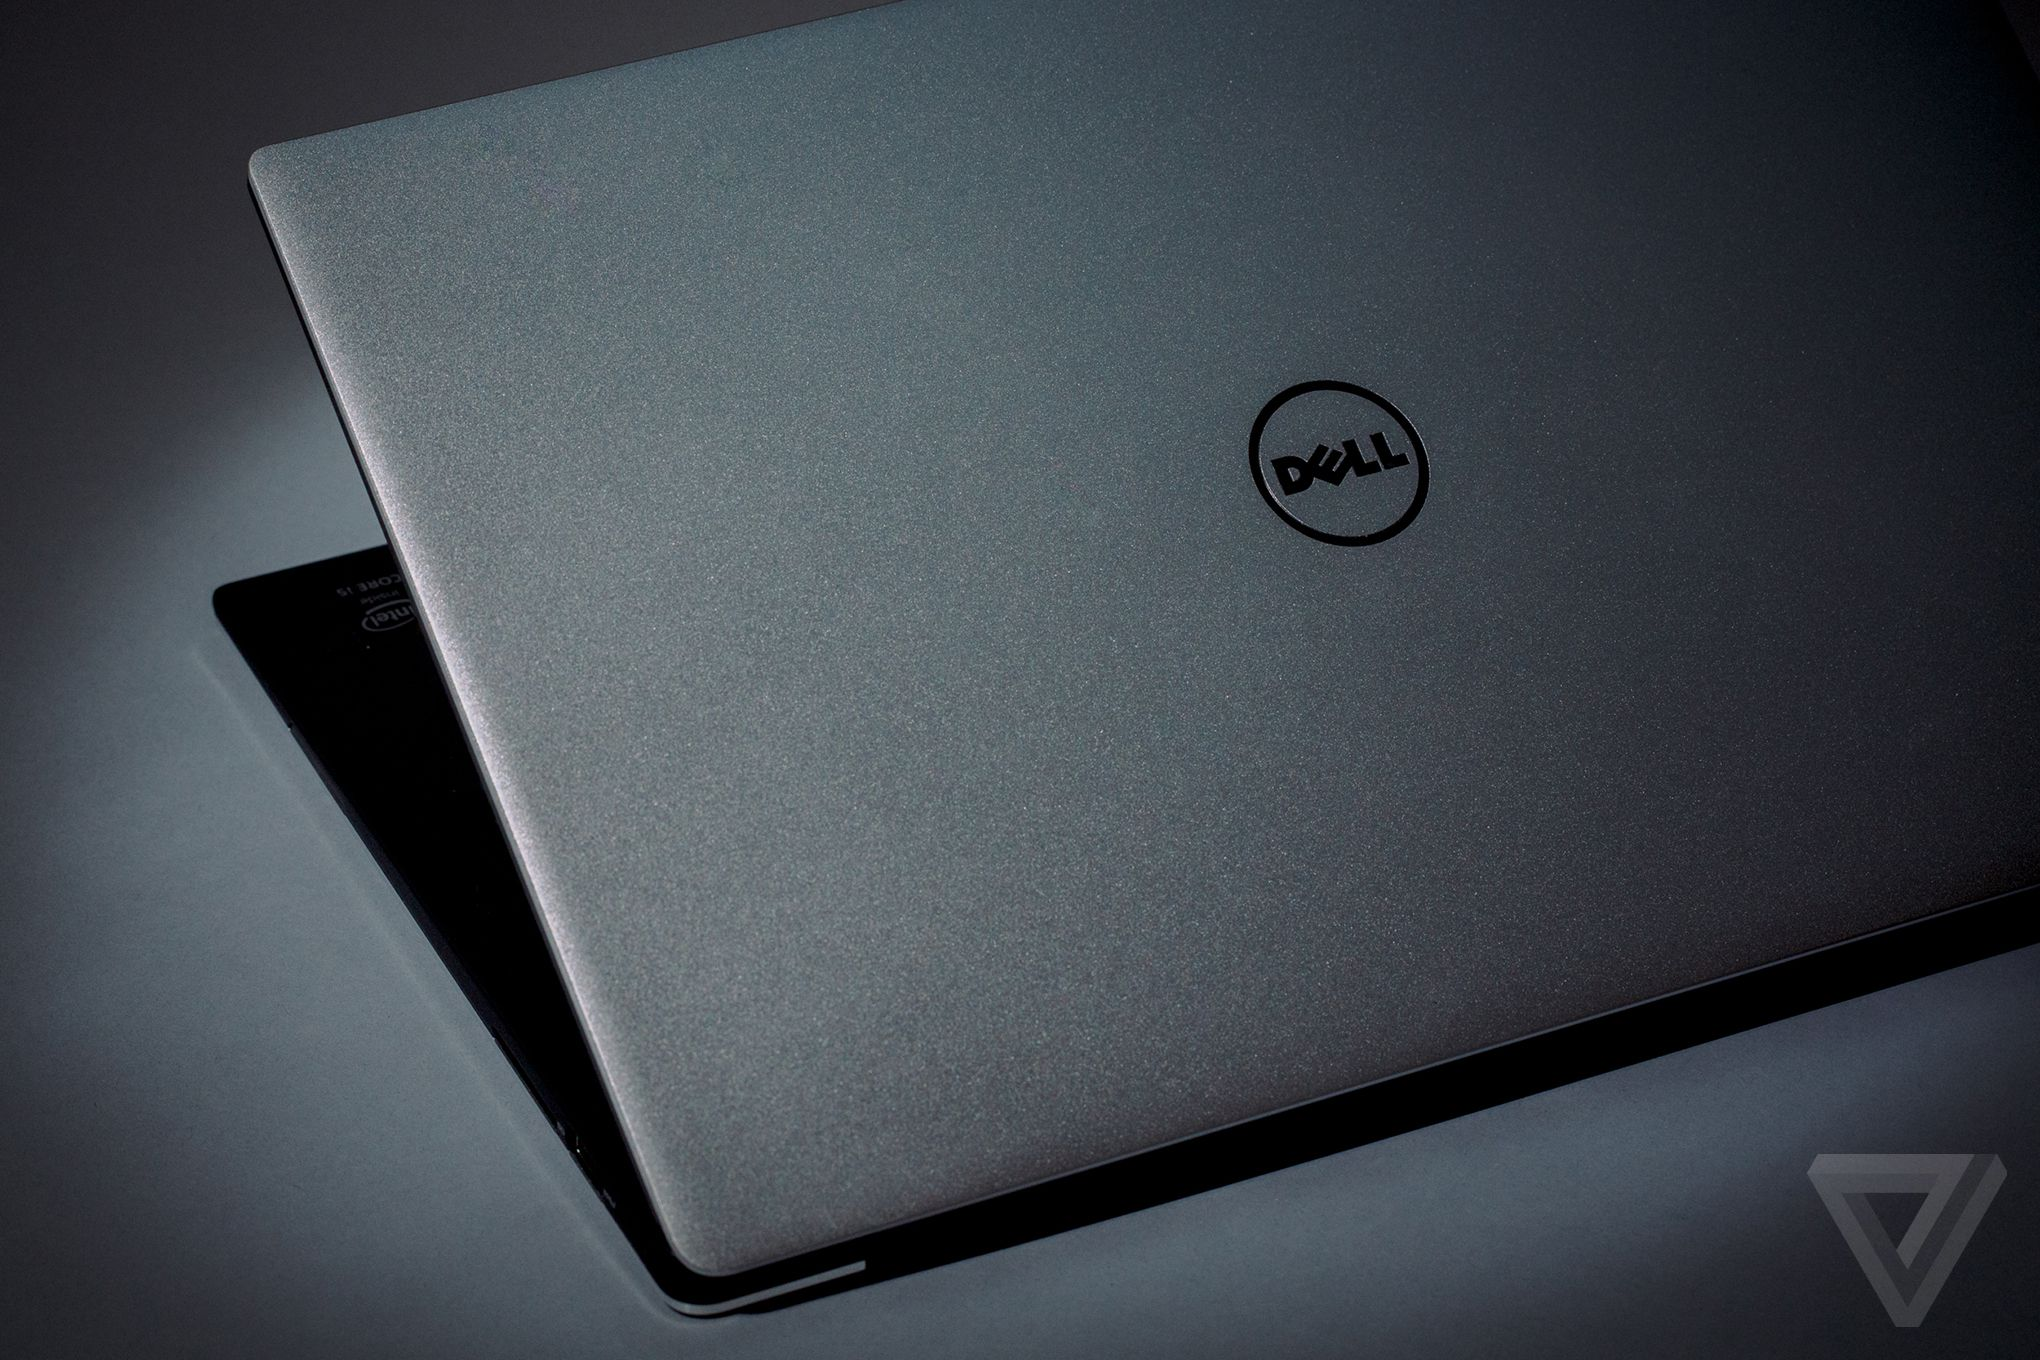 Apple Laptop or a Windows Laptop?